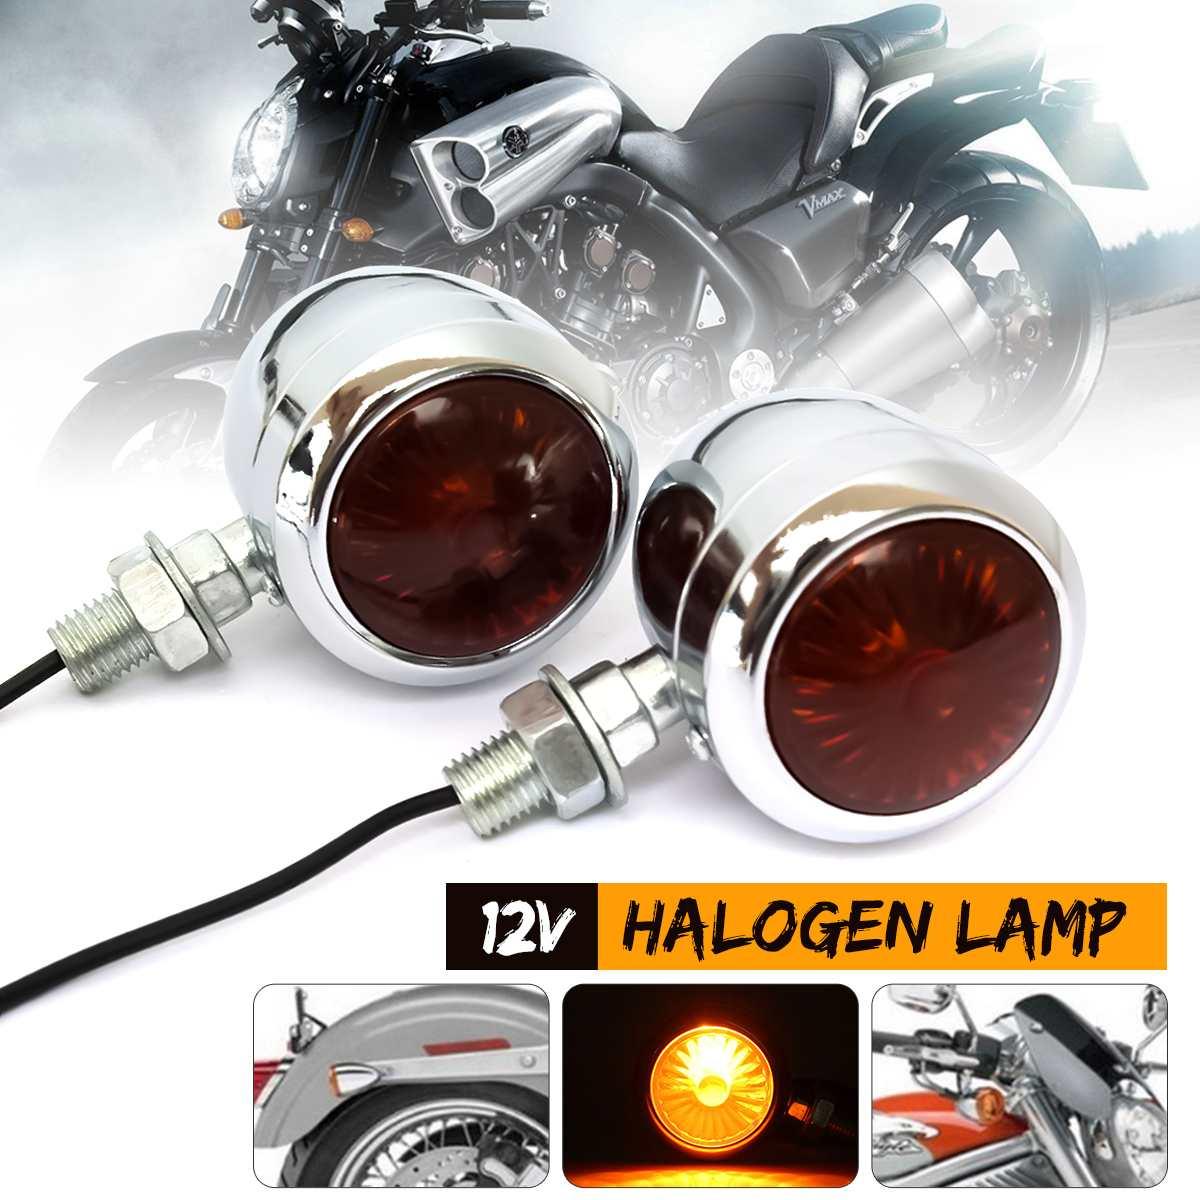 2/4Pcs 12V Retro Metal Chrome Motorcycle Turn Signal Indicator Halogen Light Bulb Lamp Vintage Amber Universal For Harley